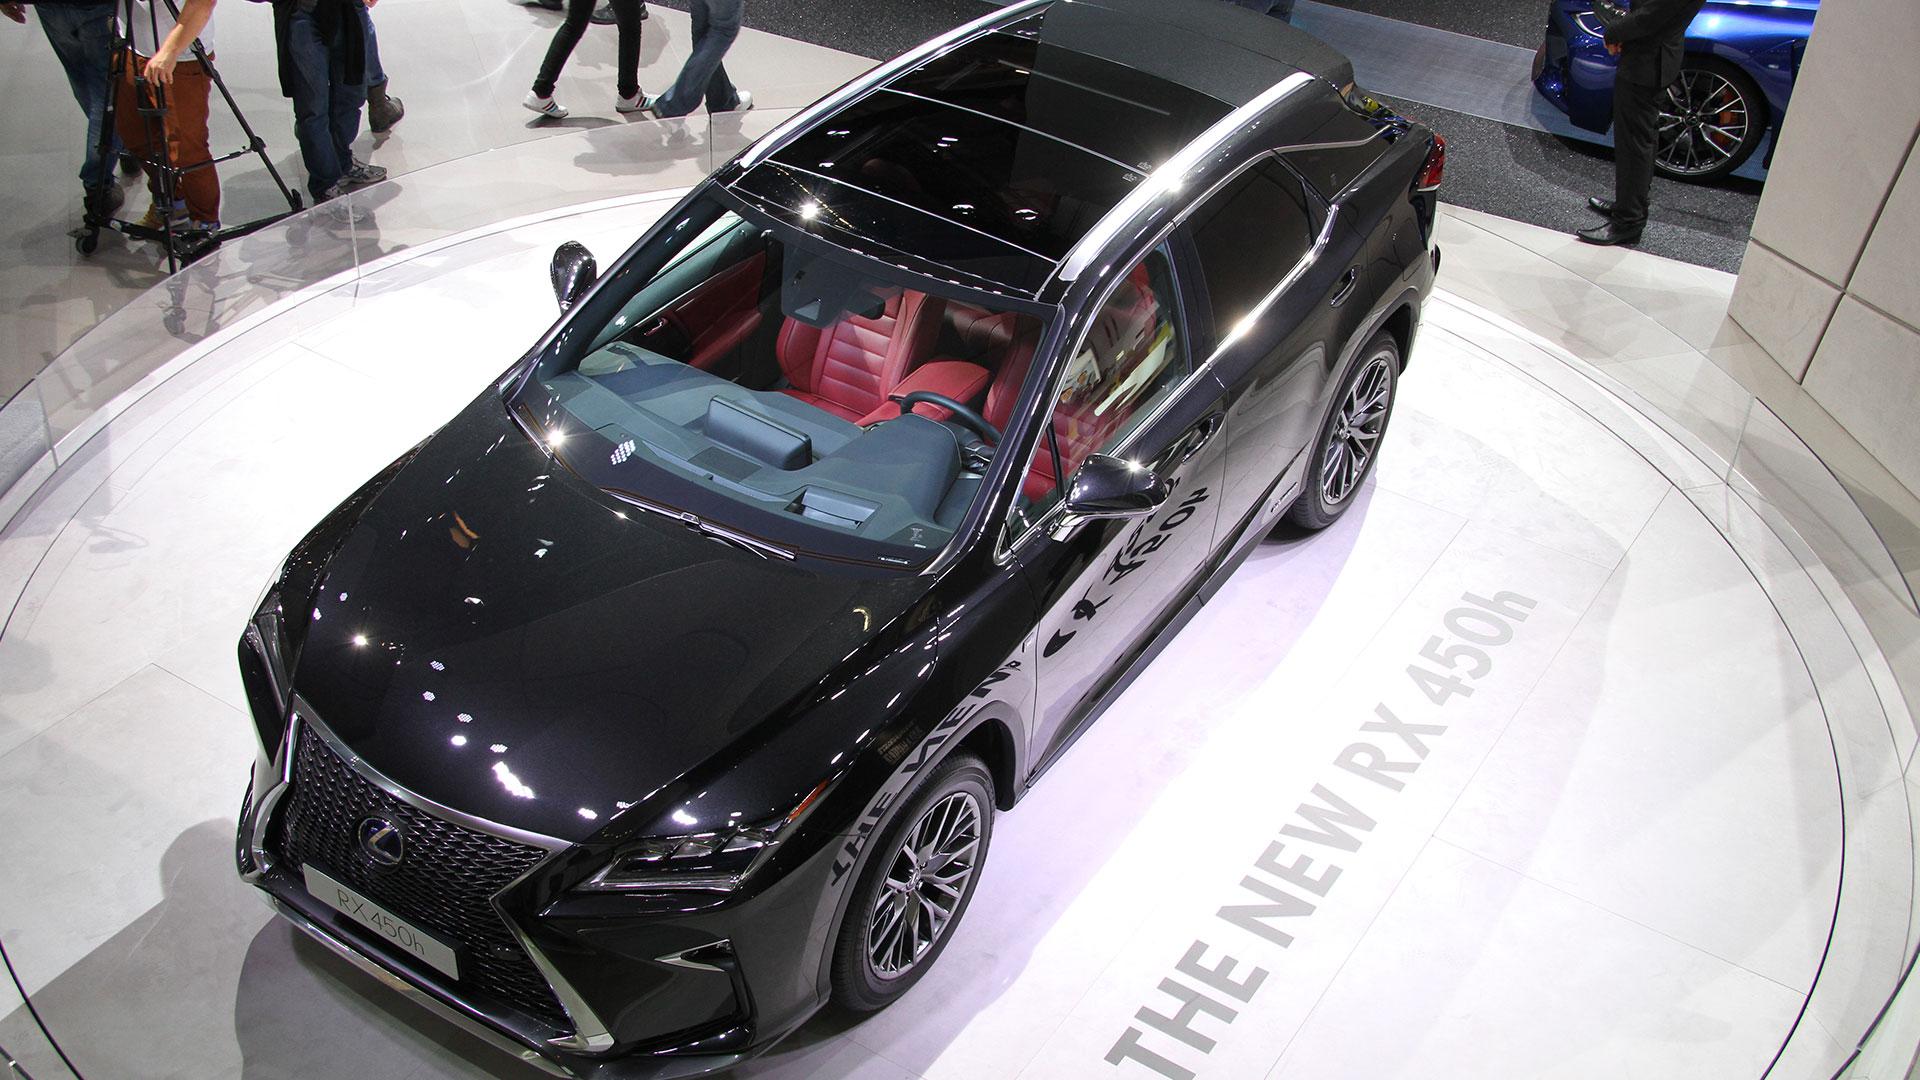 Lexus Salón del Automóvil 2015 Frankfurt hero asset